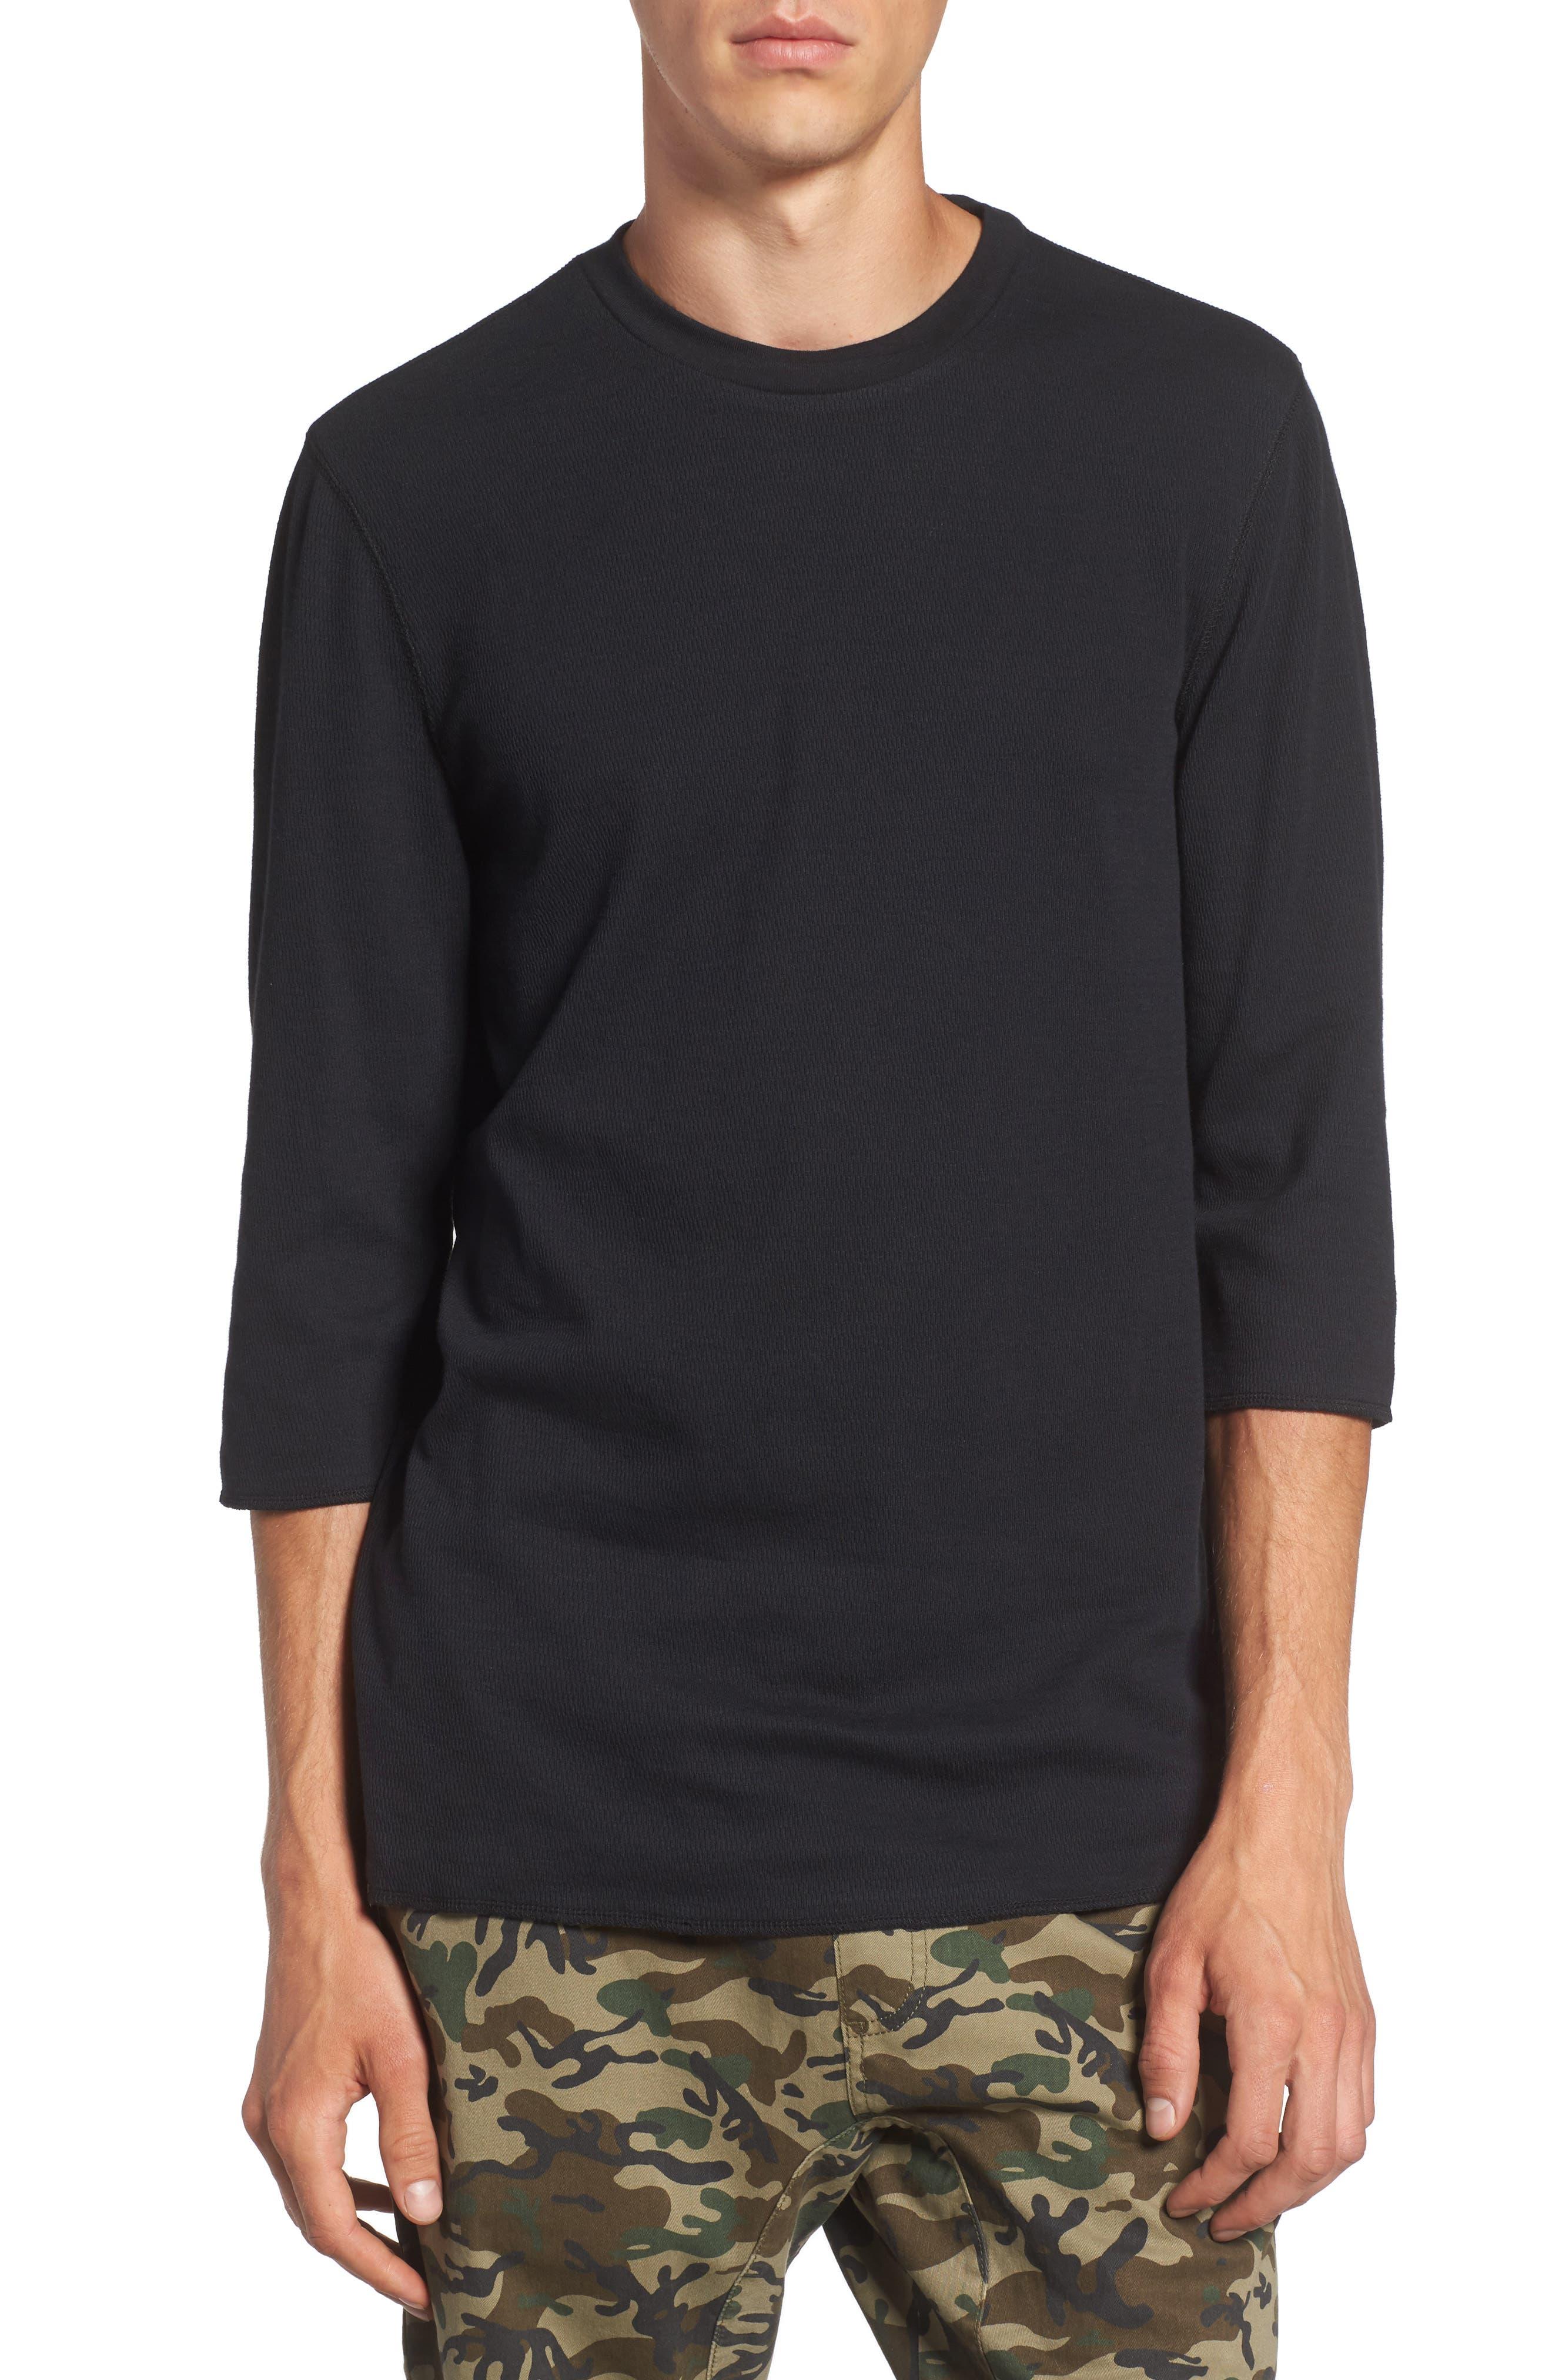 Main Image - The Rail Three-Quarter-Sleeve Thermal T-Shirt